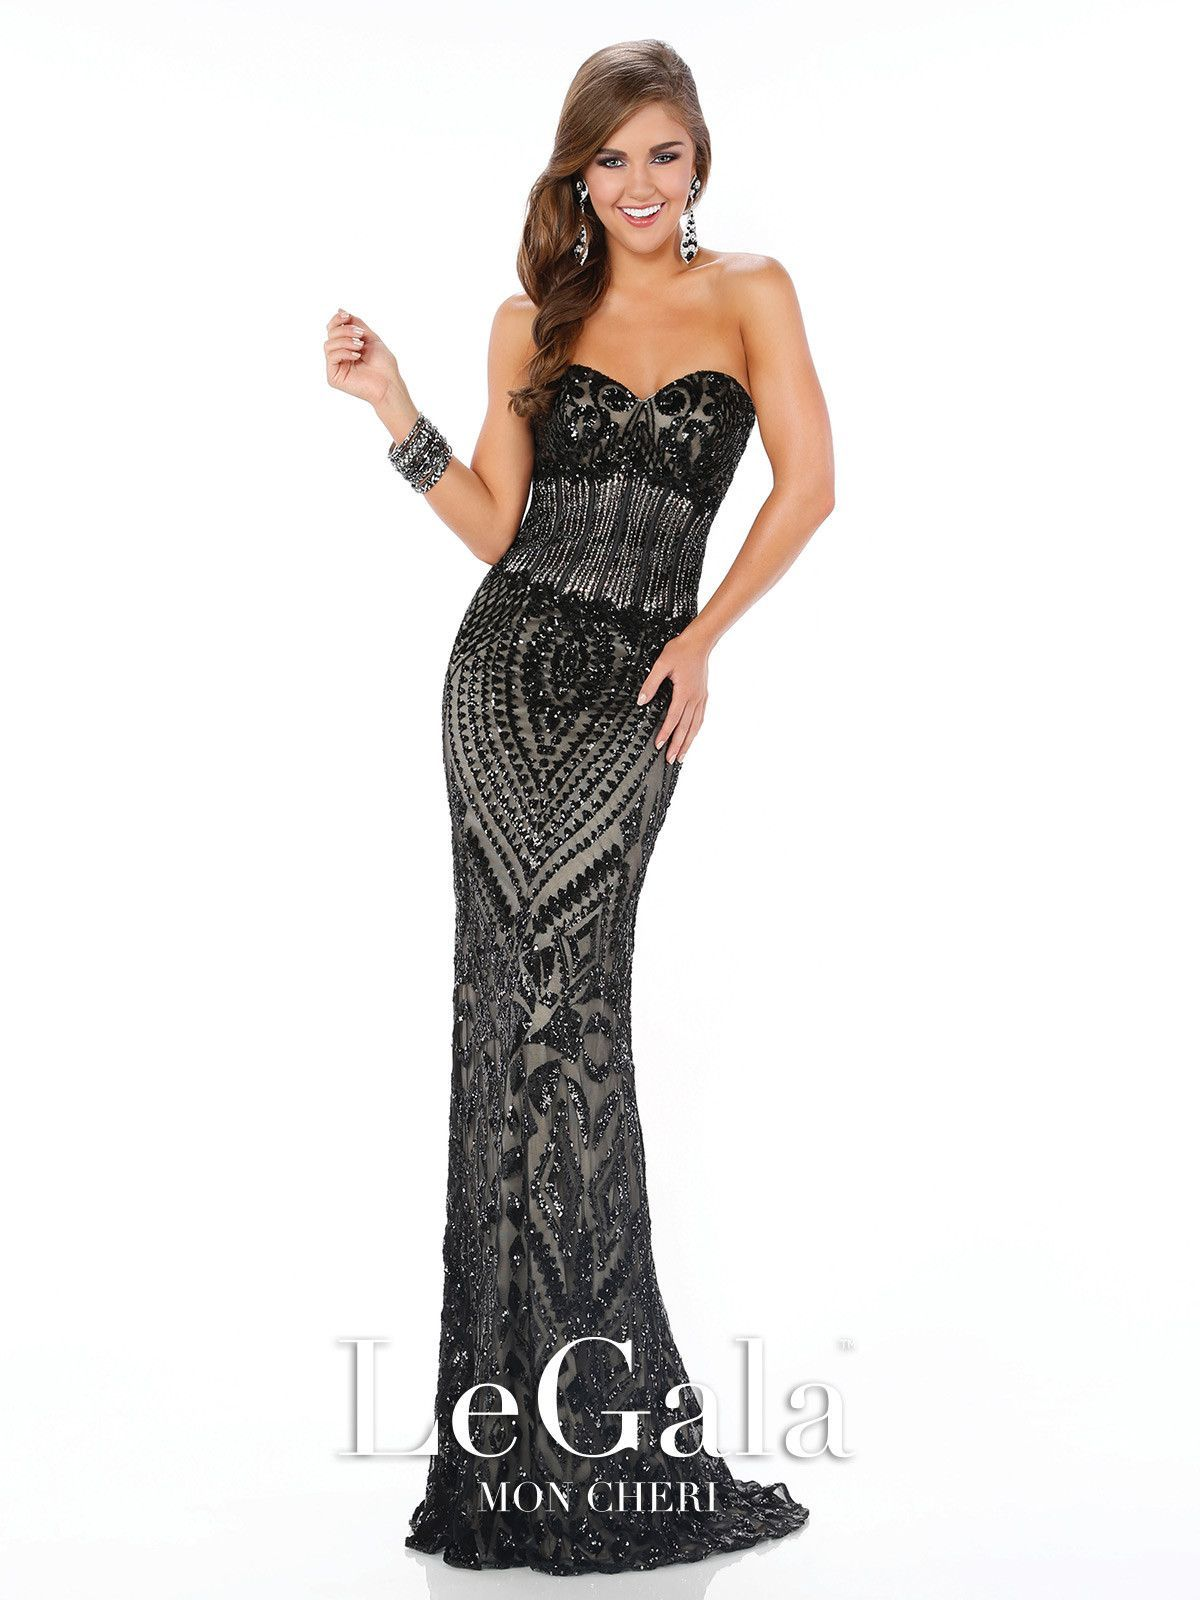 Le Gala by Mon Cheri 116541 Black SZ 0 Sequin Slim Fit Prom Dress Evening Gown